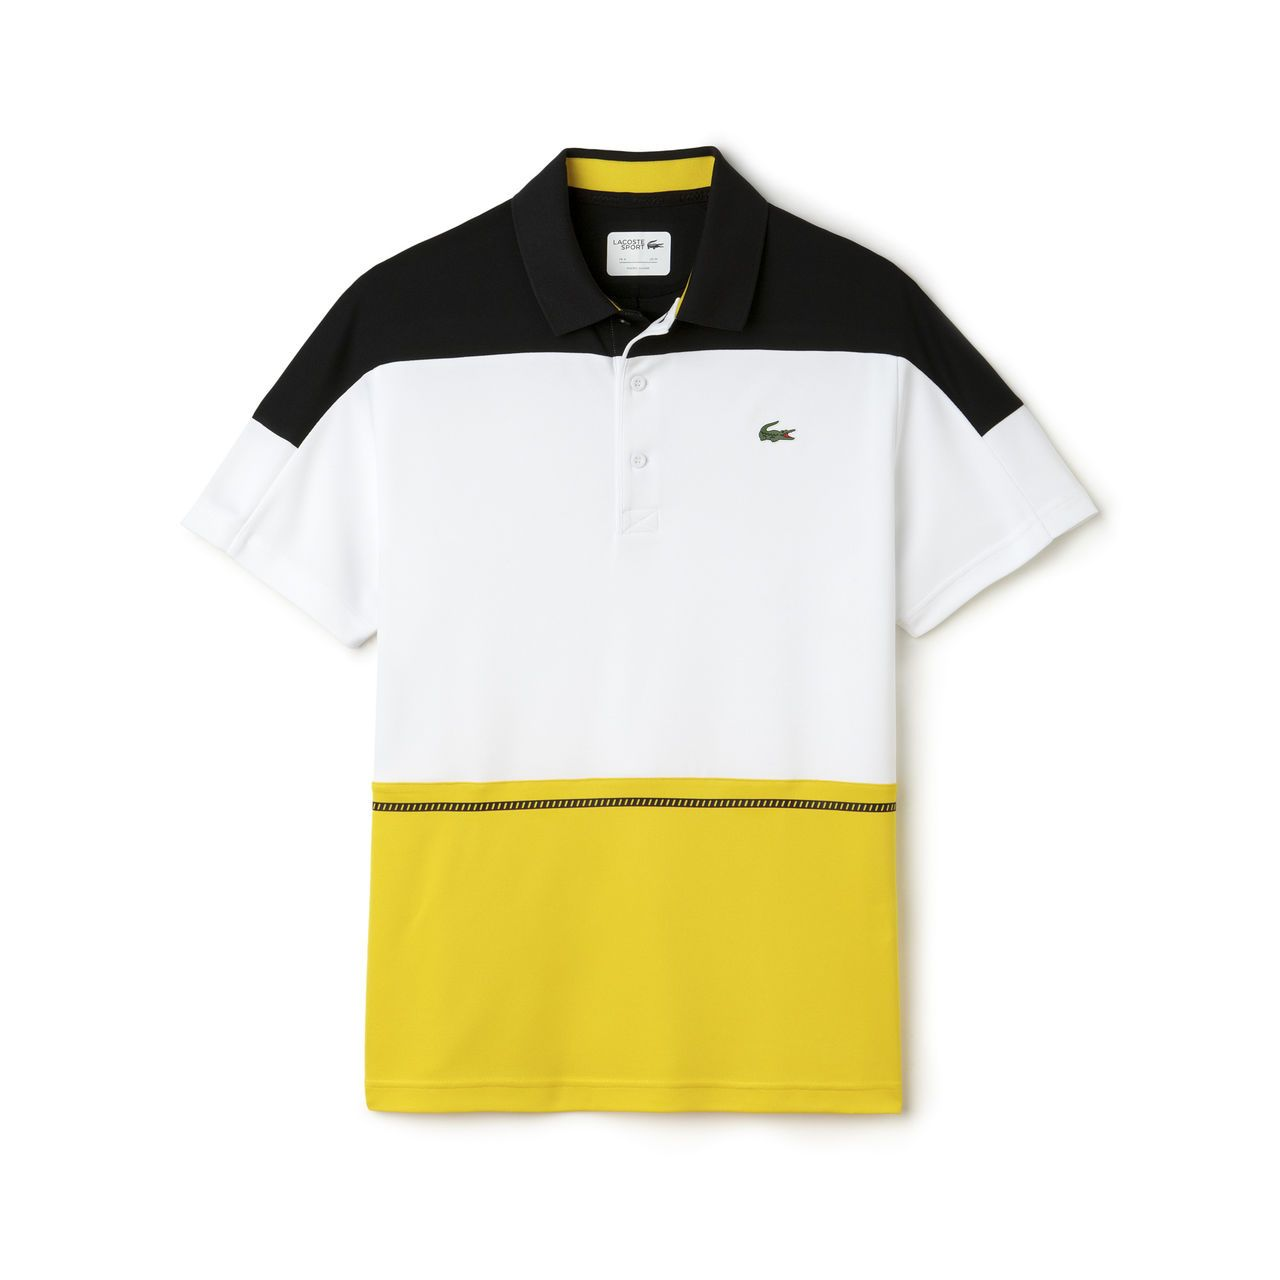 Men S Sport Ultra Dry Color Block Tennis Polo Lacoste Polo Shirts Polo Shirt Design Polo Shirt Style